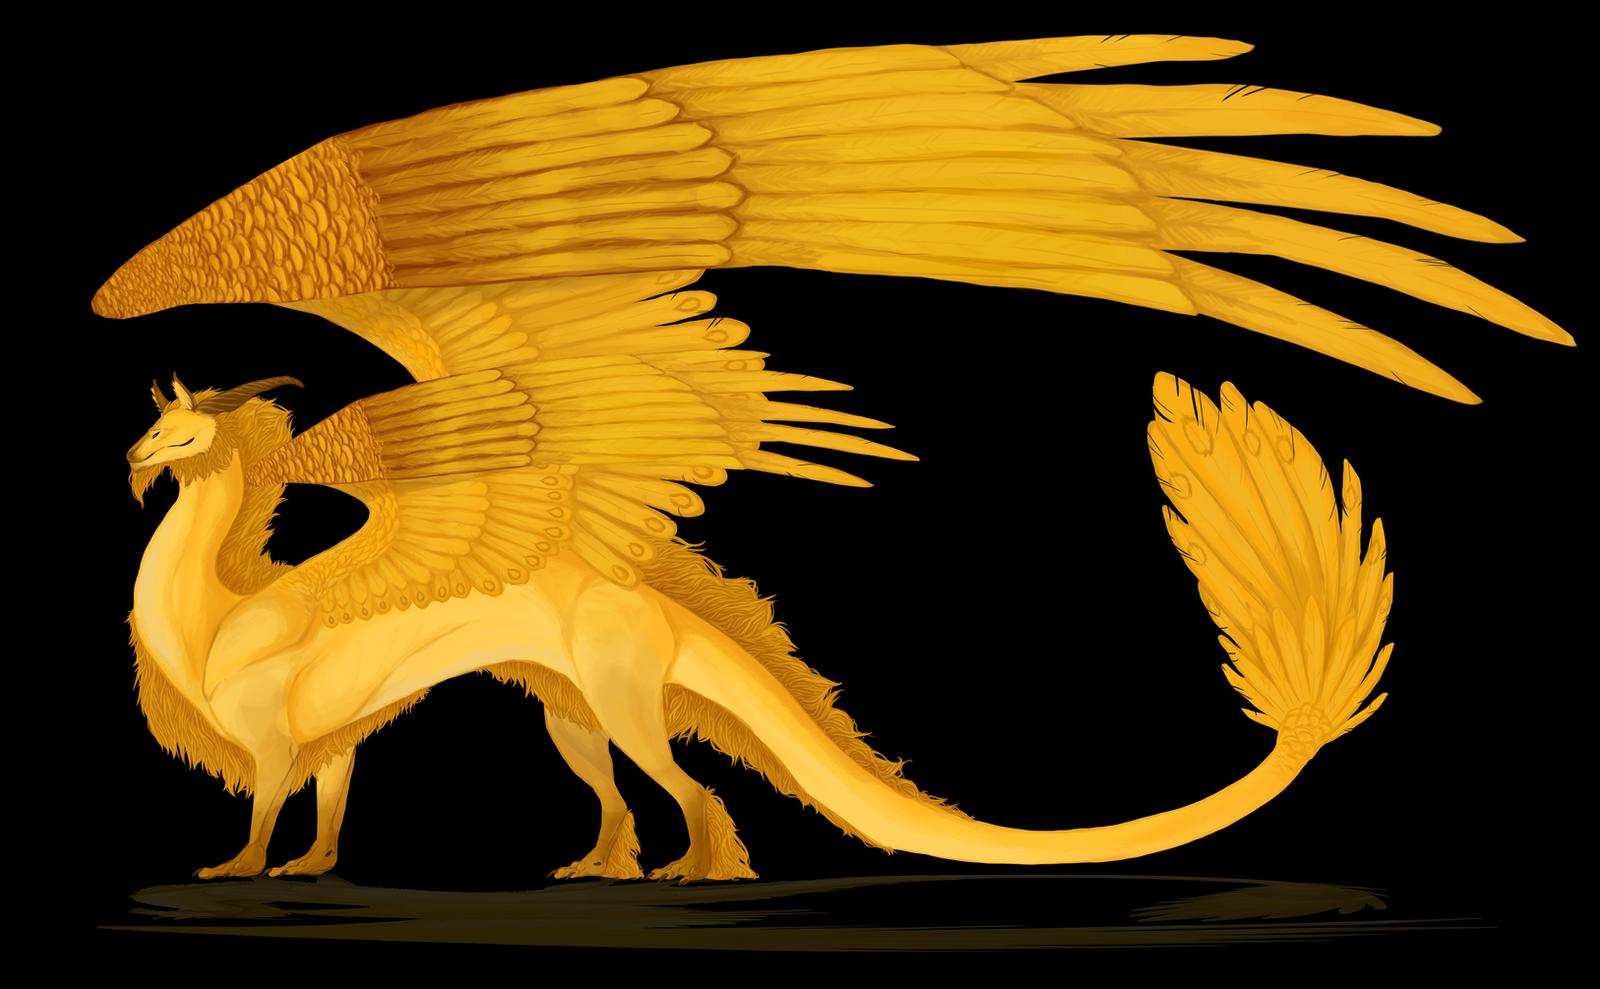 Golden dragon deviantart steroid induced insomnia